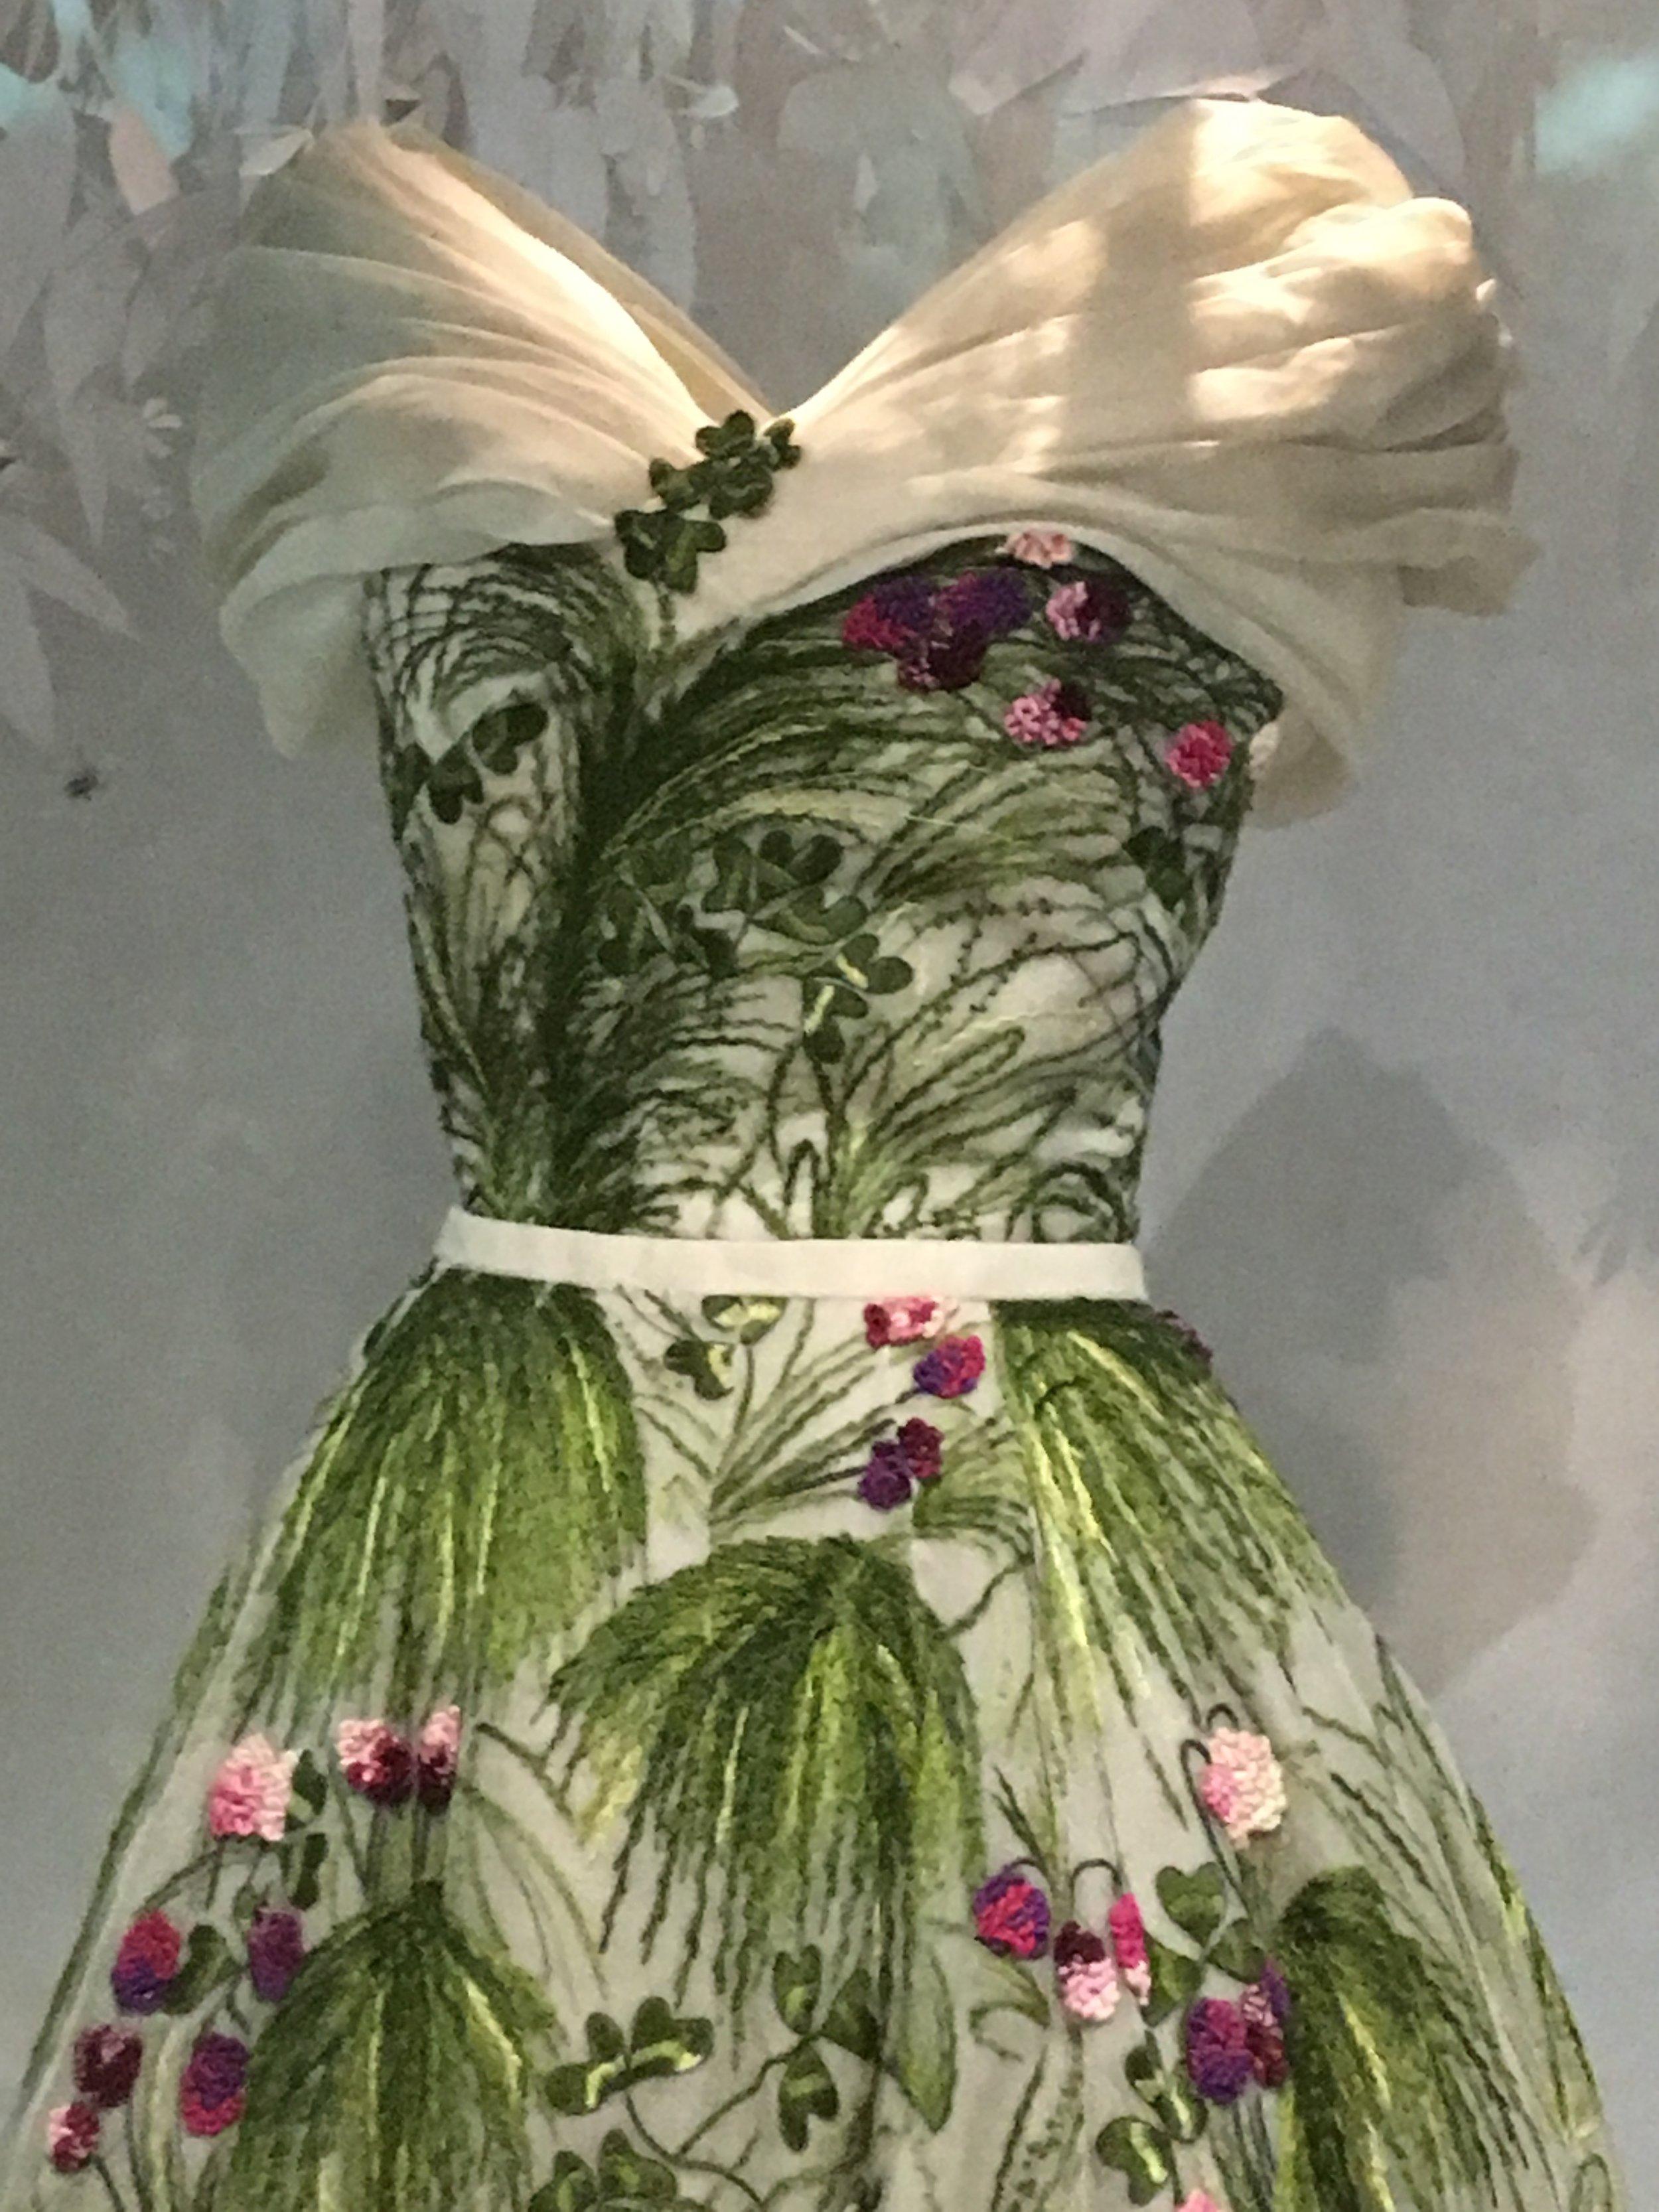 'May', Christian Dior, HC S/S 1953